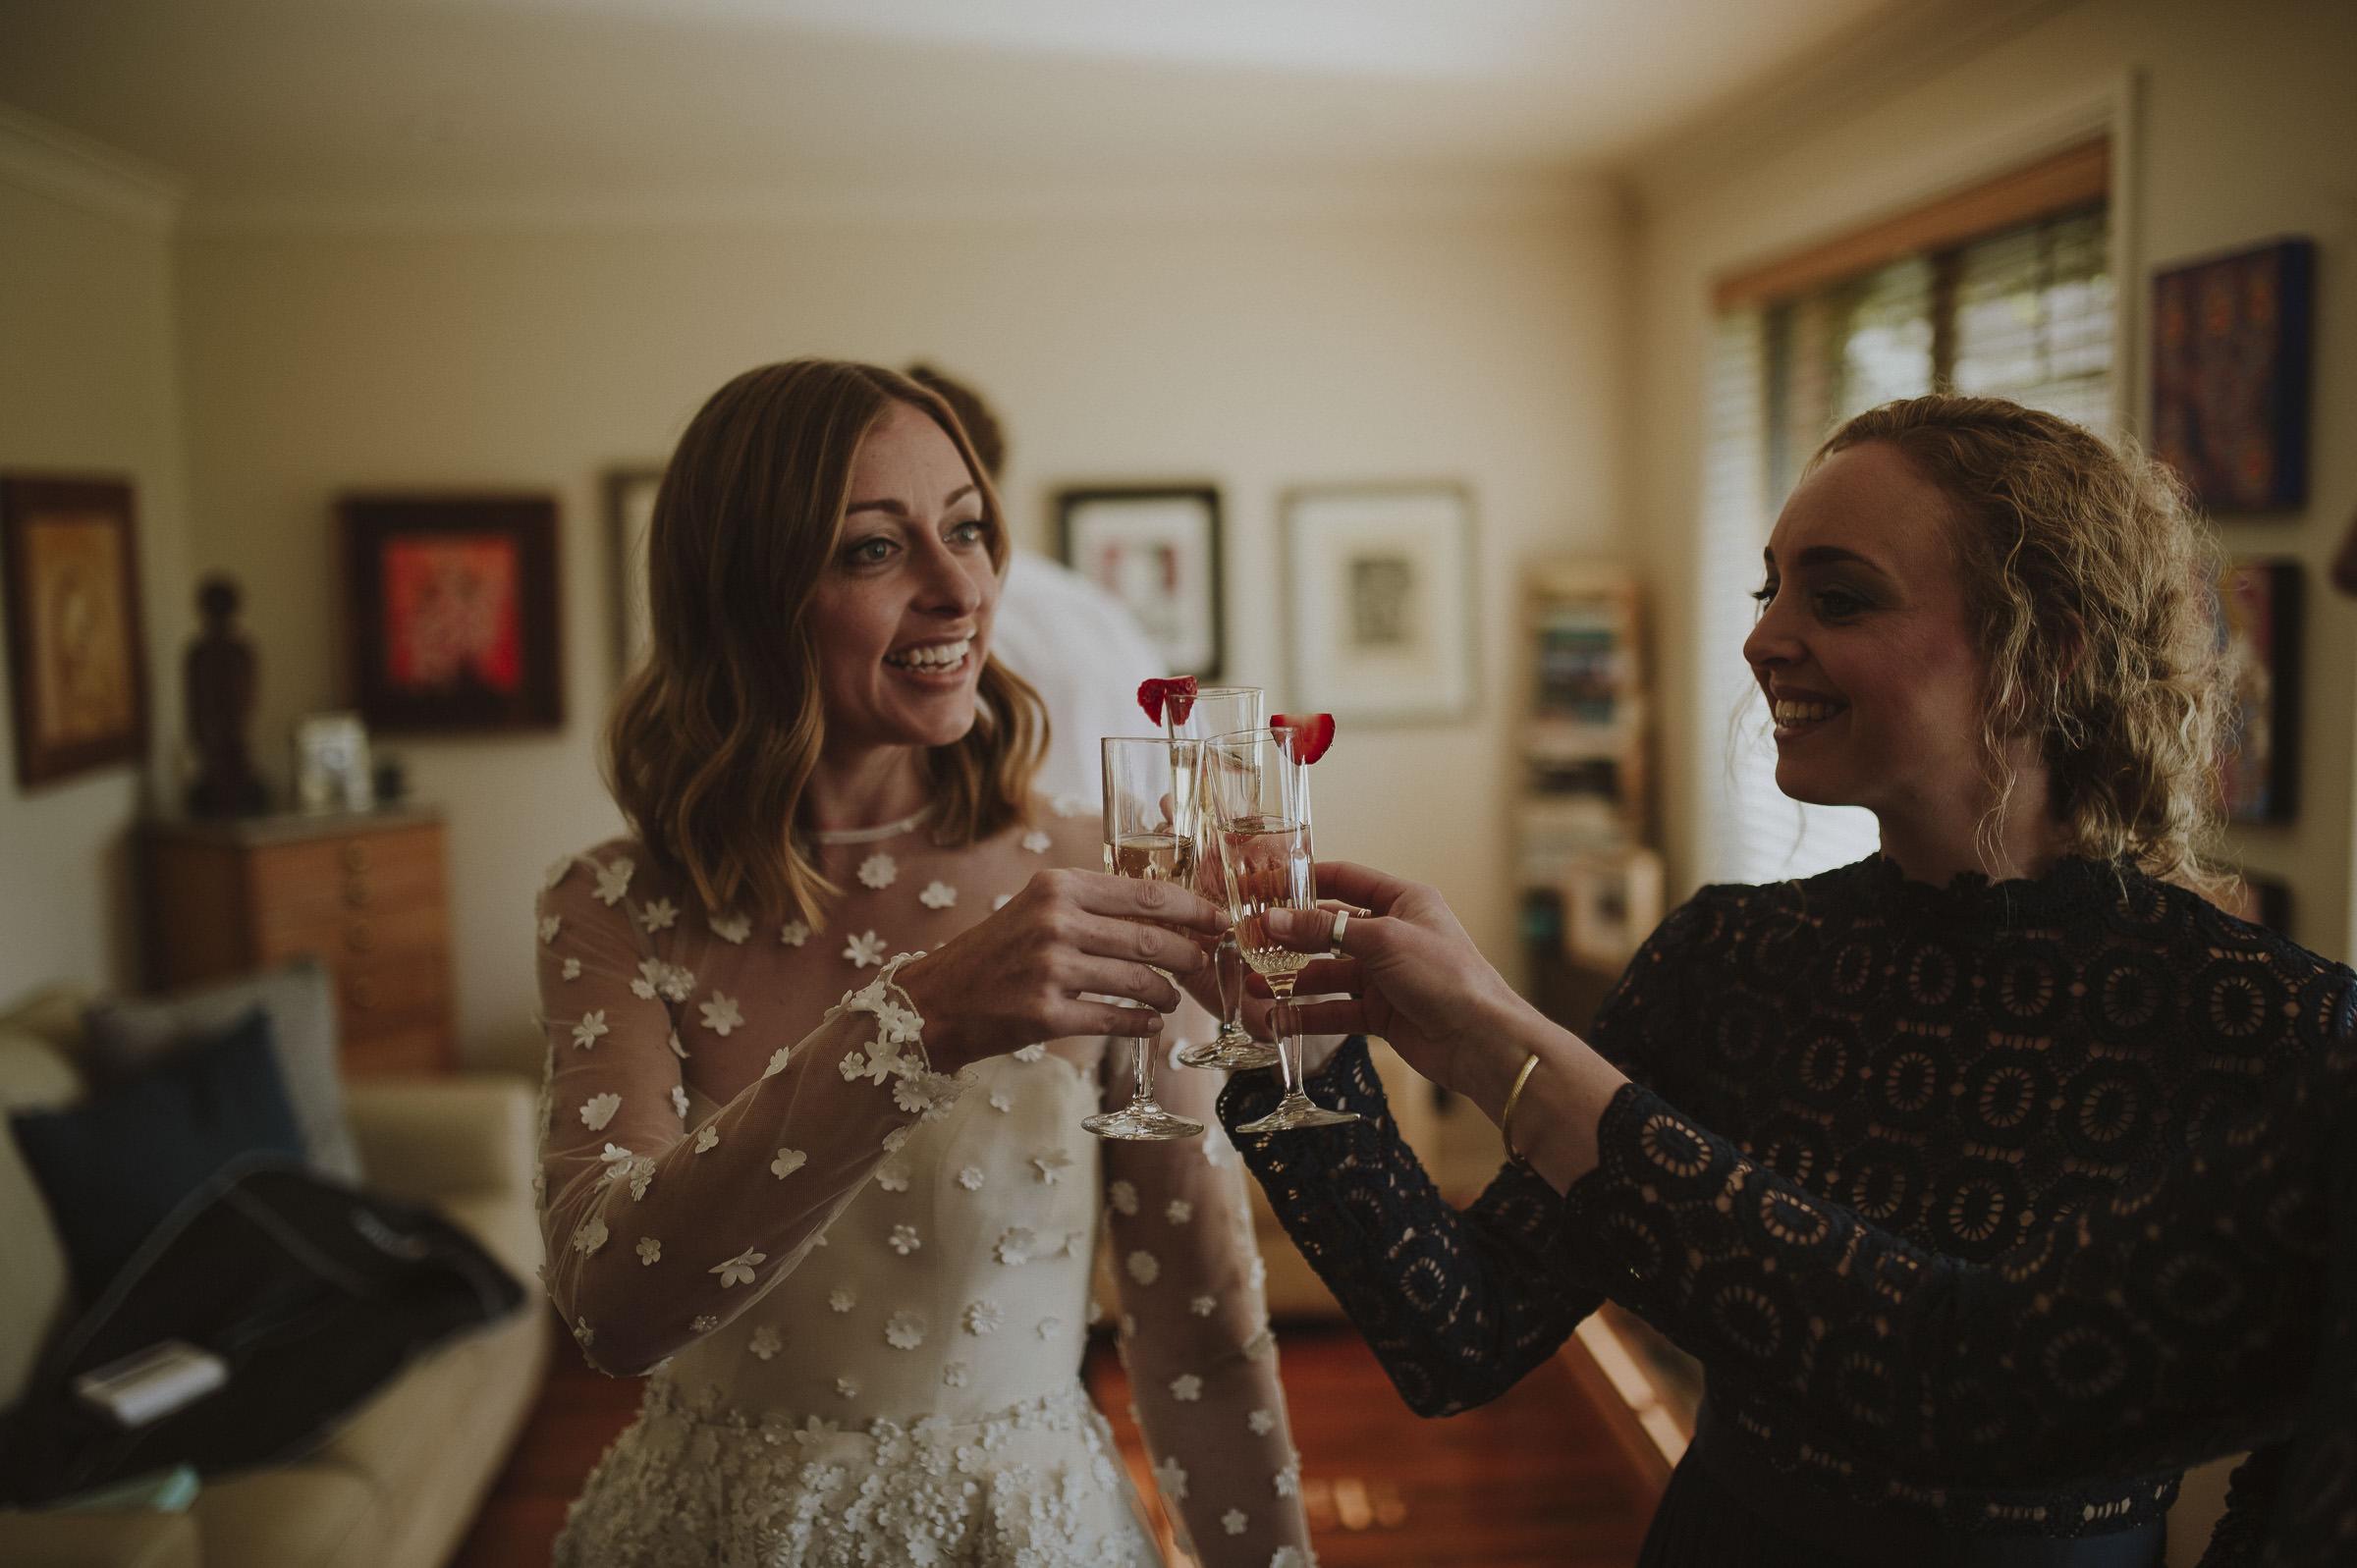 Emily_Skewesy_Mudgee_Wedding_Blog-4.jpg